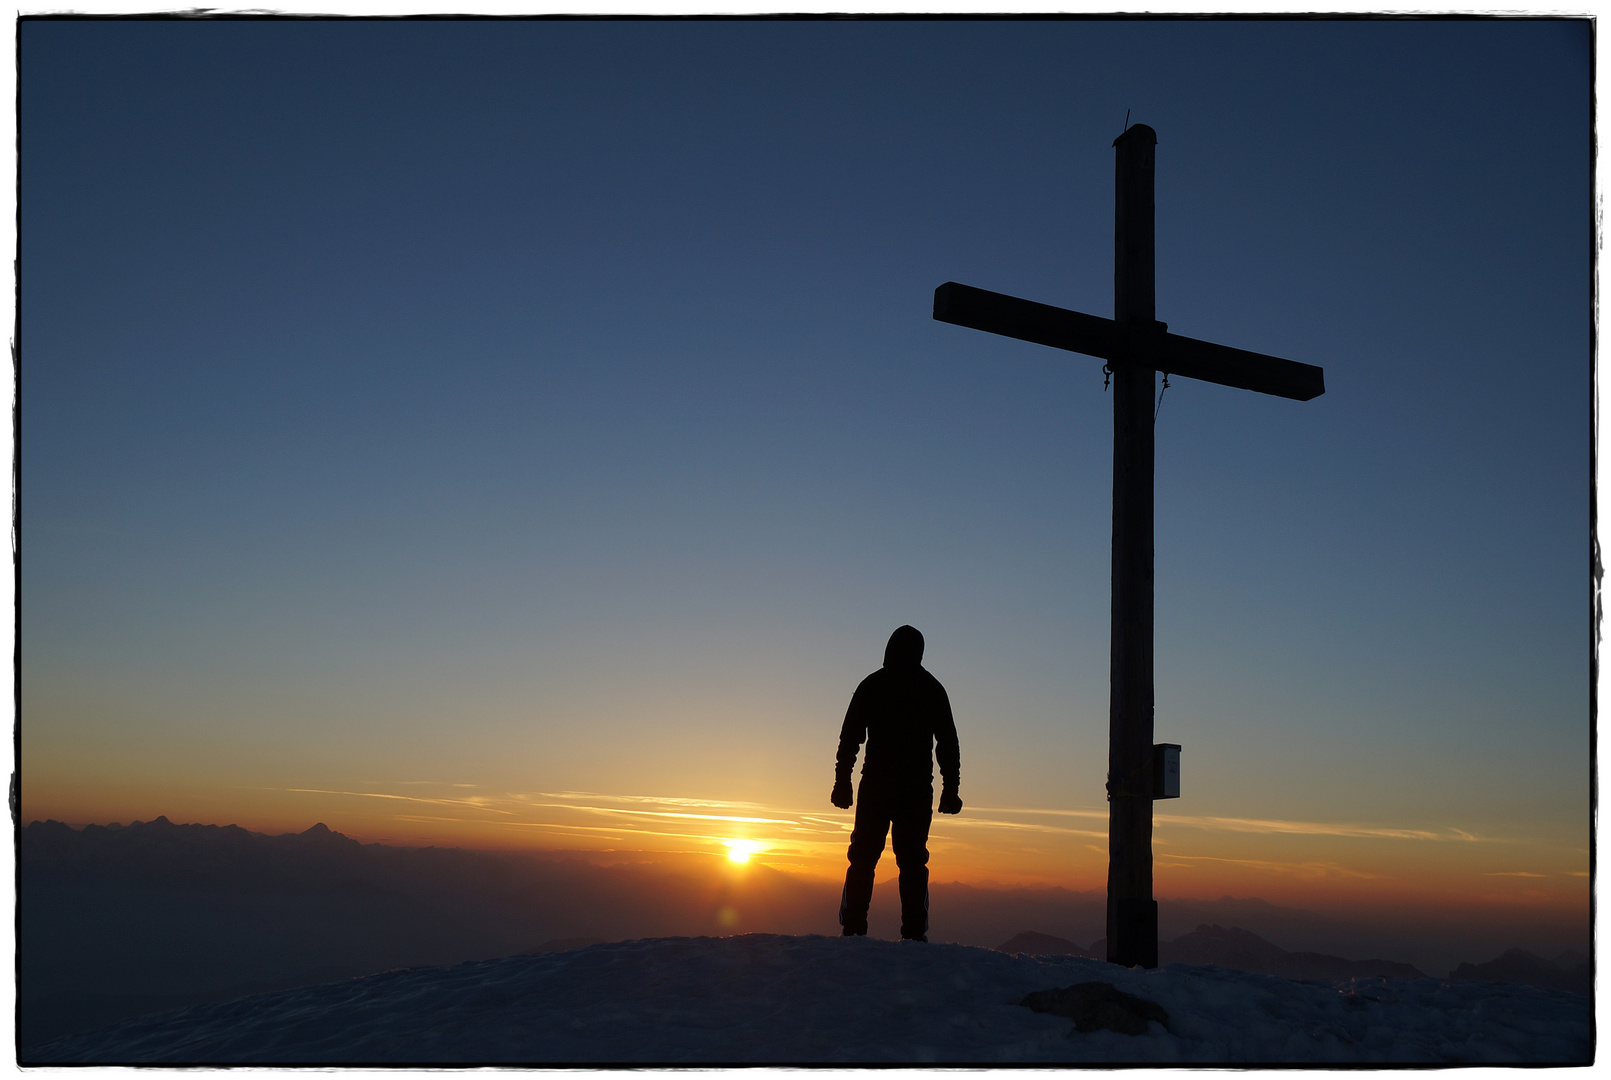 Sonnenaufgang Peitlerkofel (2875 m)